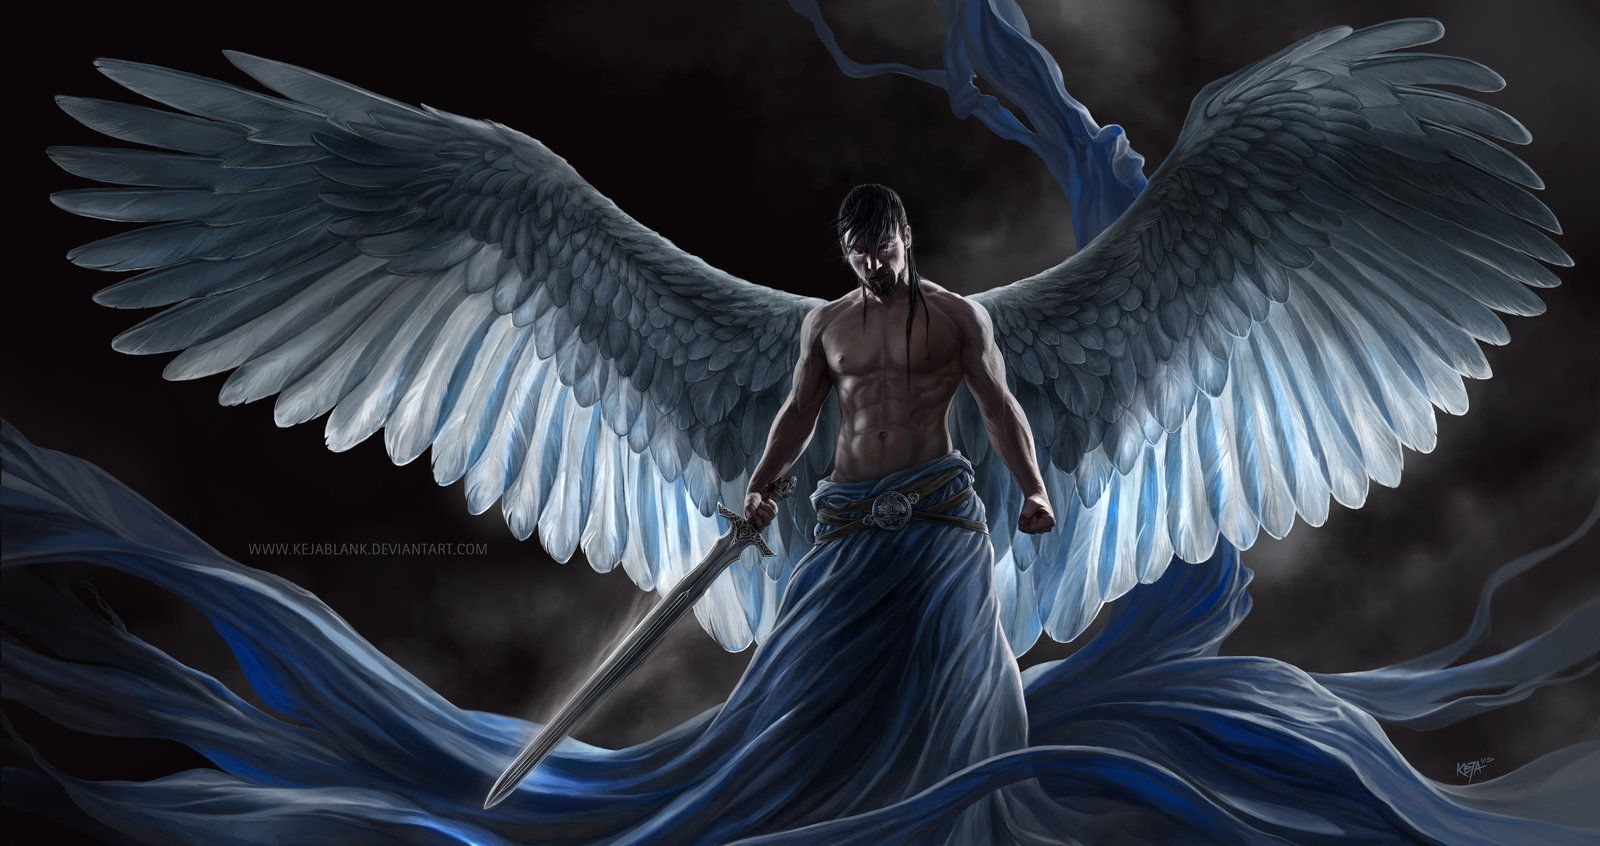 pin blue angels hd - photo #38